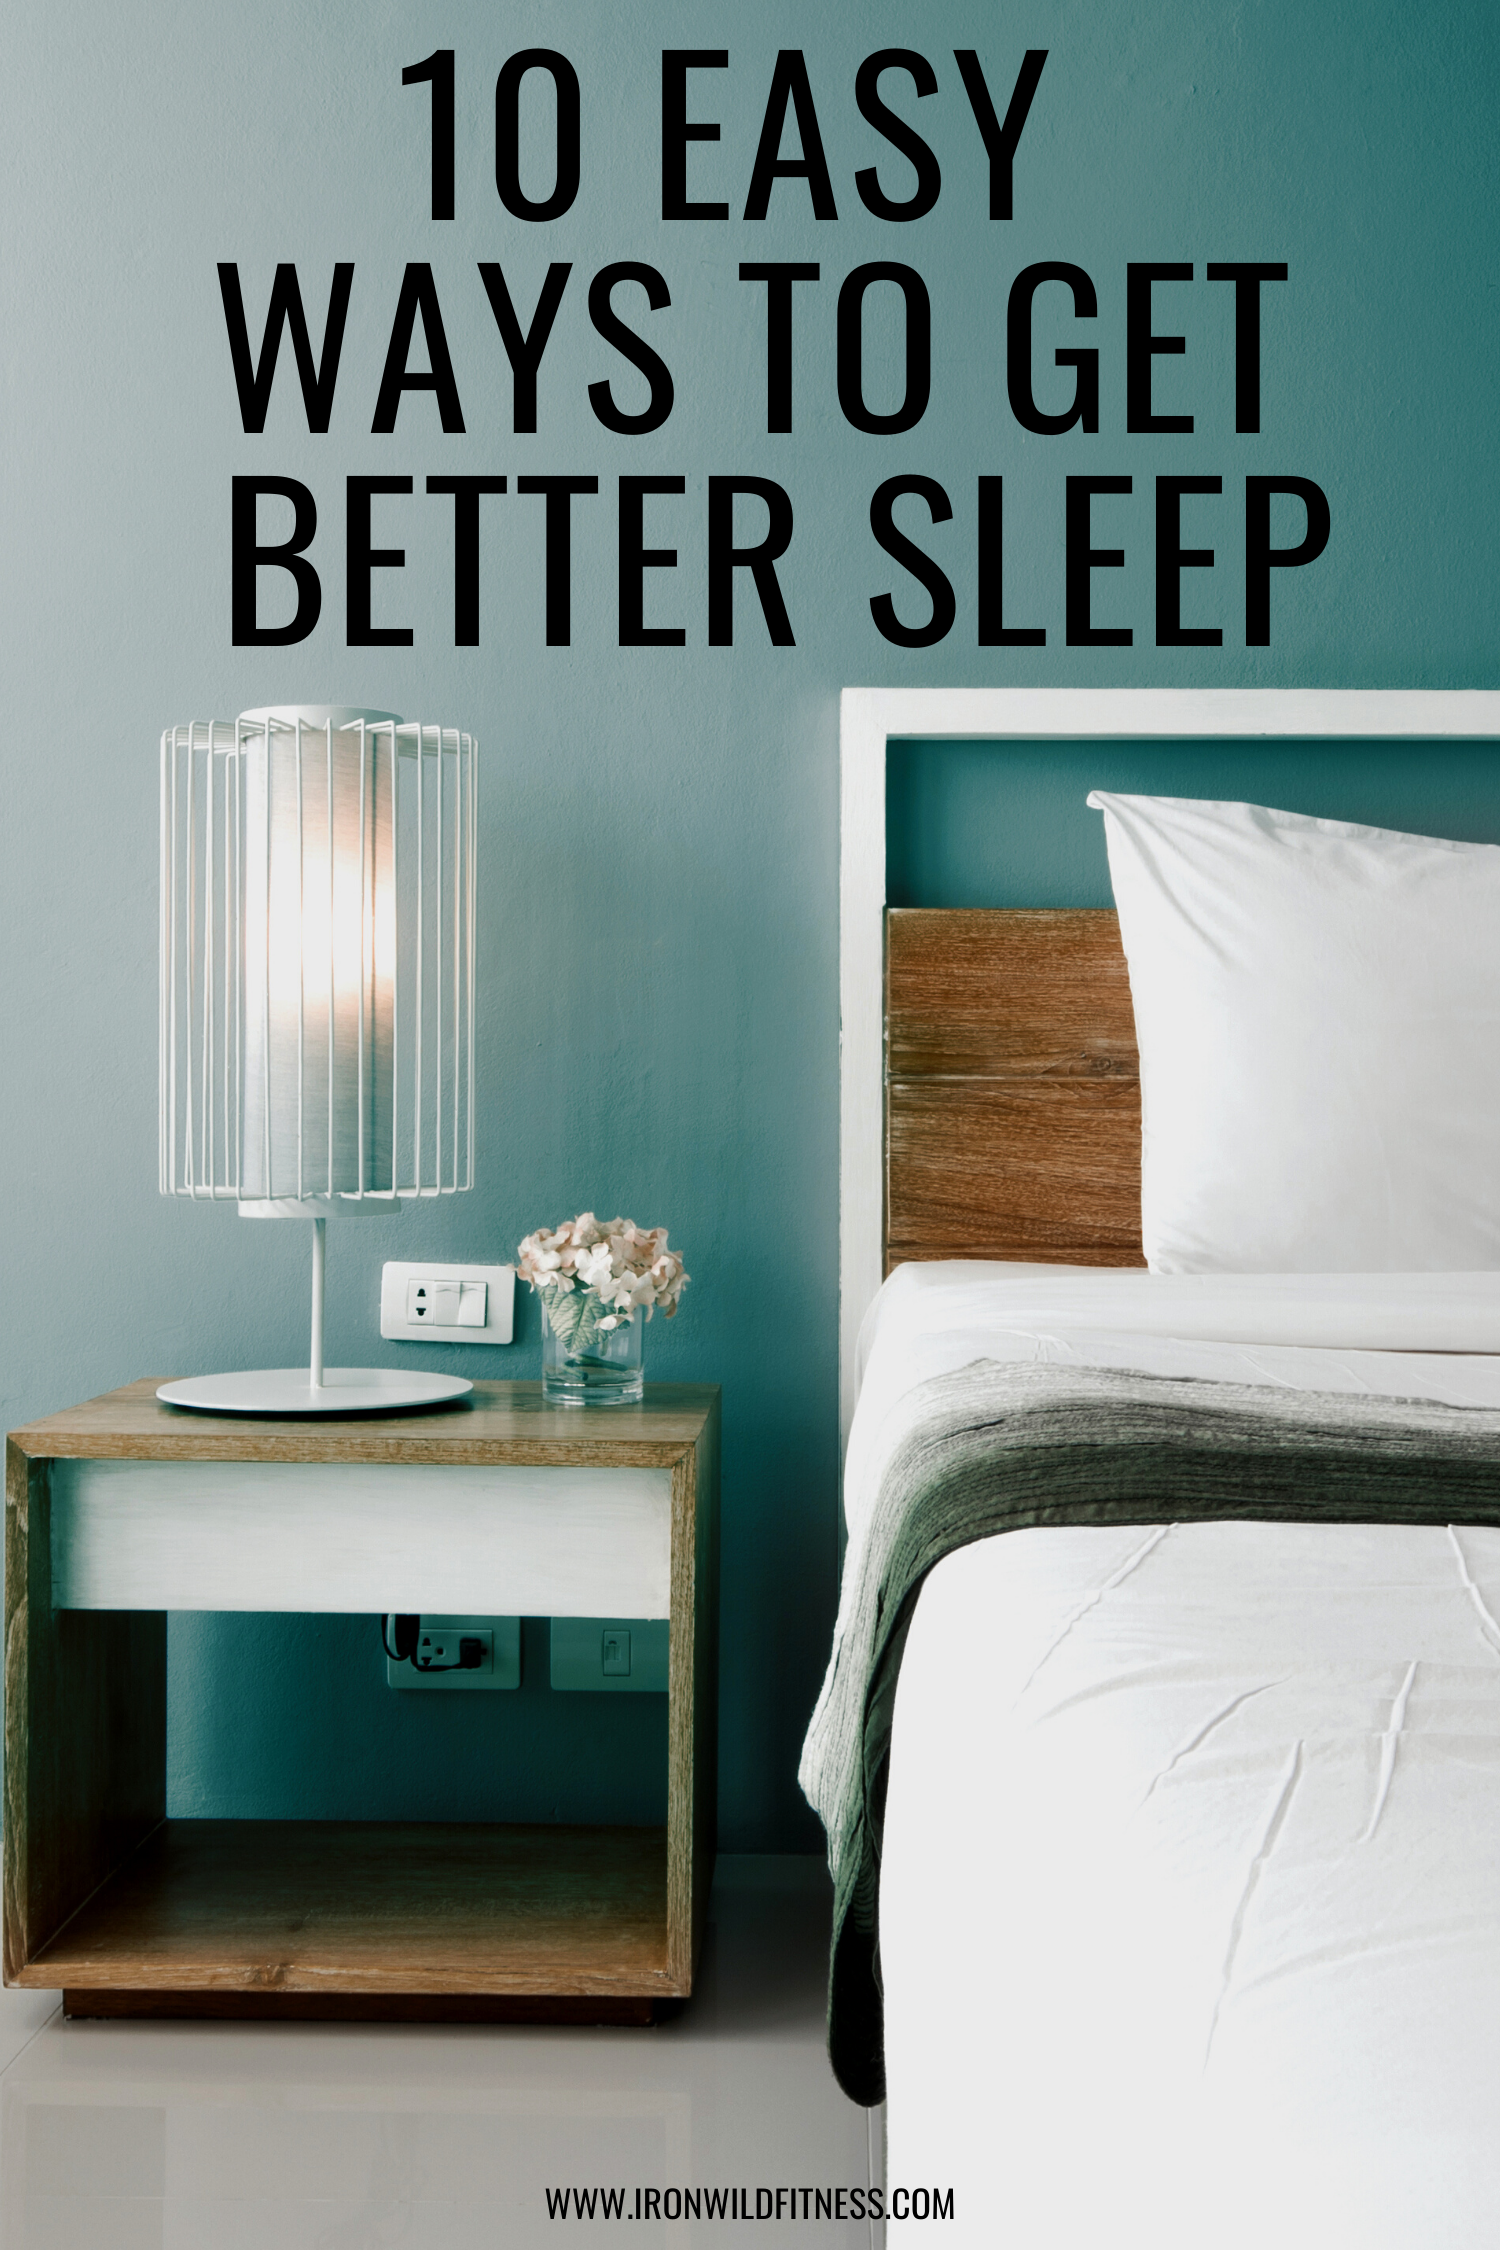 EASY WAYS TO GET BETTER SLEEP